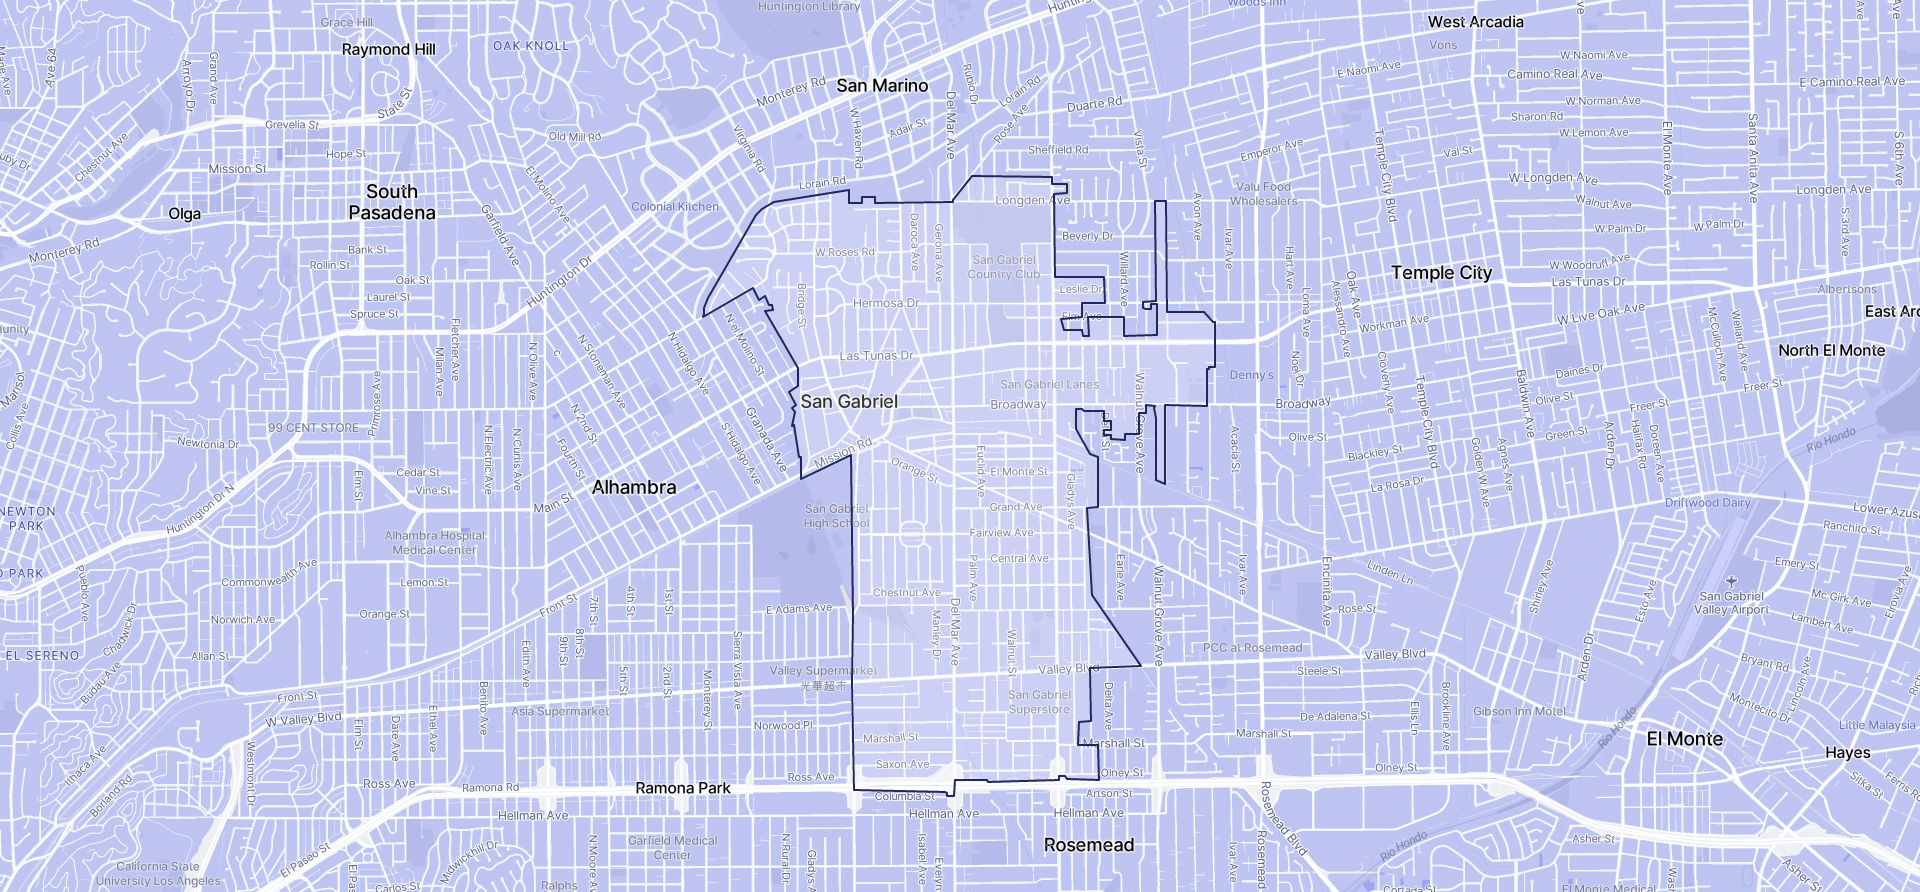 Image of San Gabriel boundaries on a map.